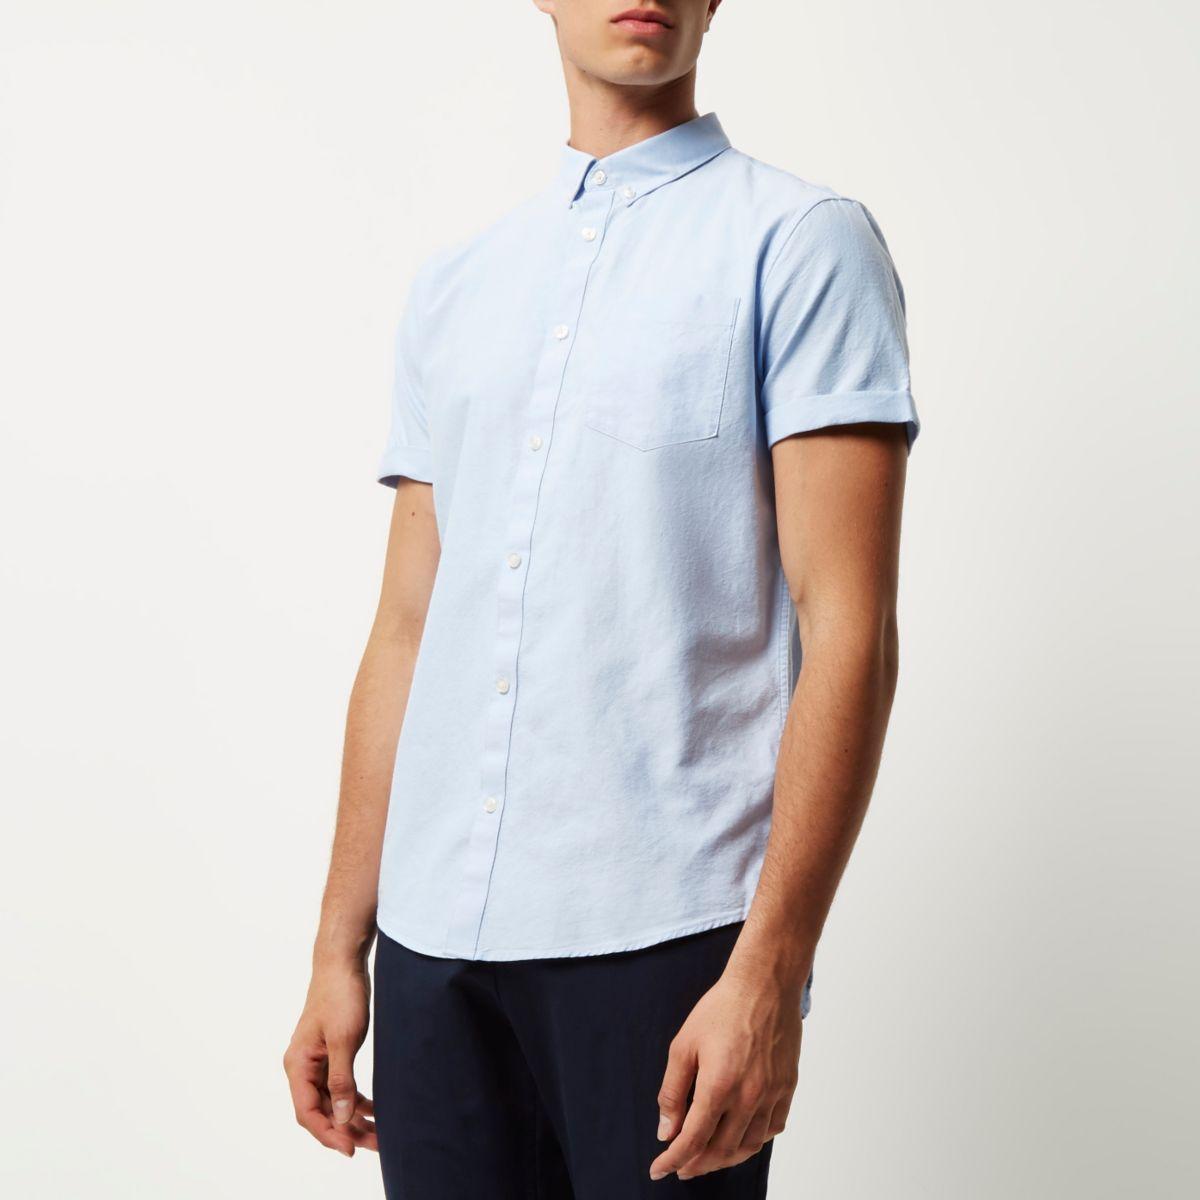 Chemise Oxford bleu clair casual à manches courtes